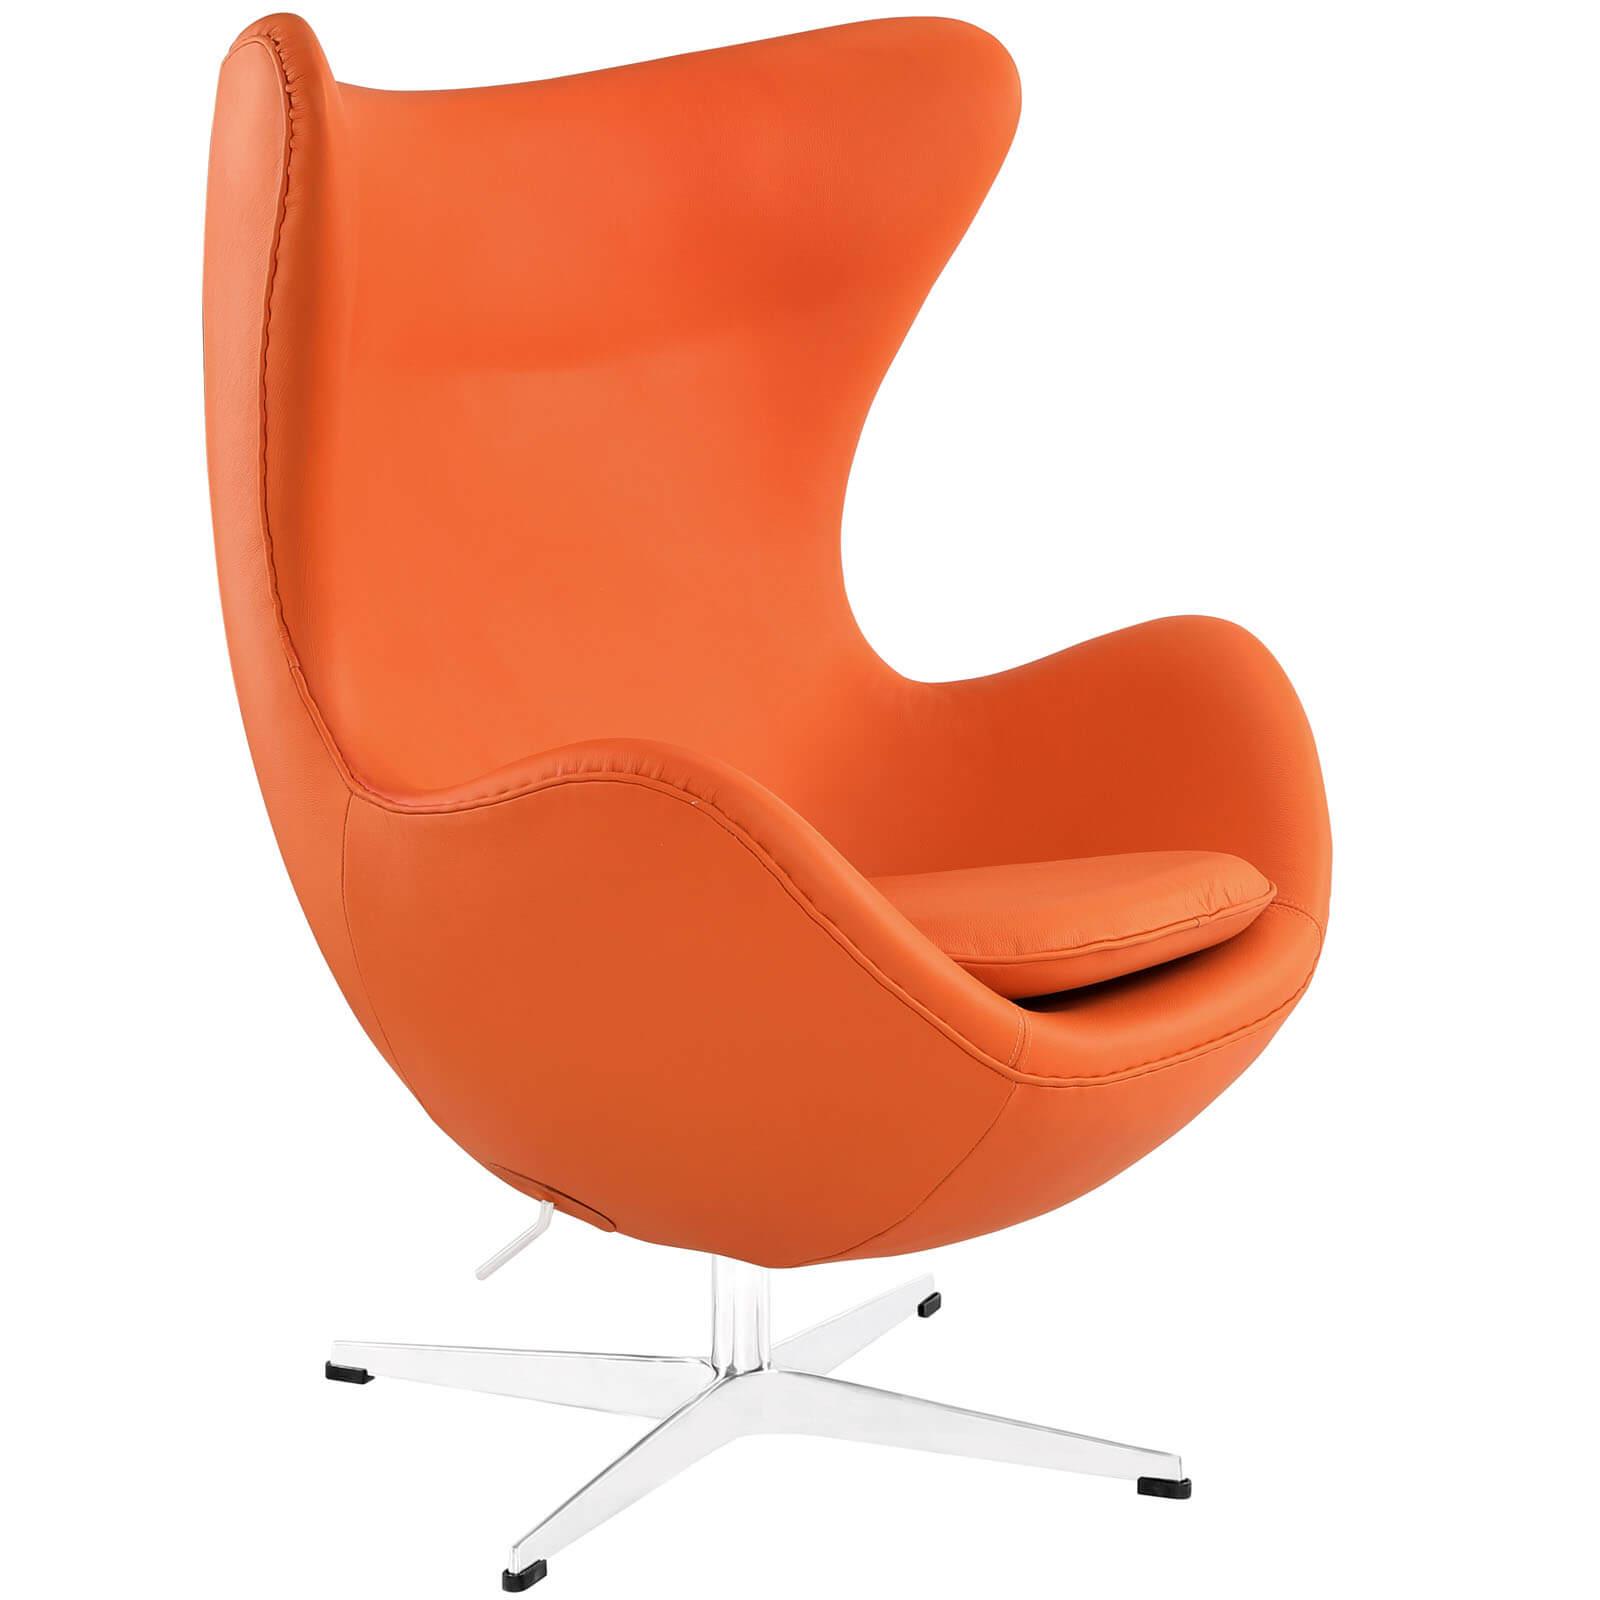 Glove Leather Lounge Chair, Orange Buy Online At Best Price   SohoMod